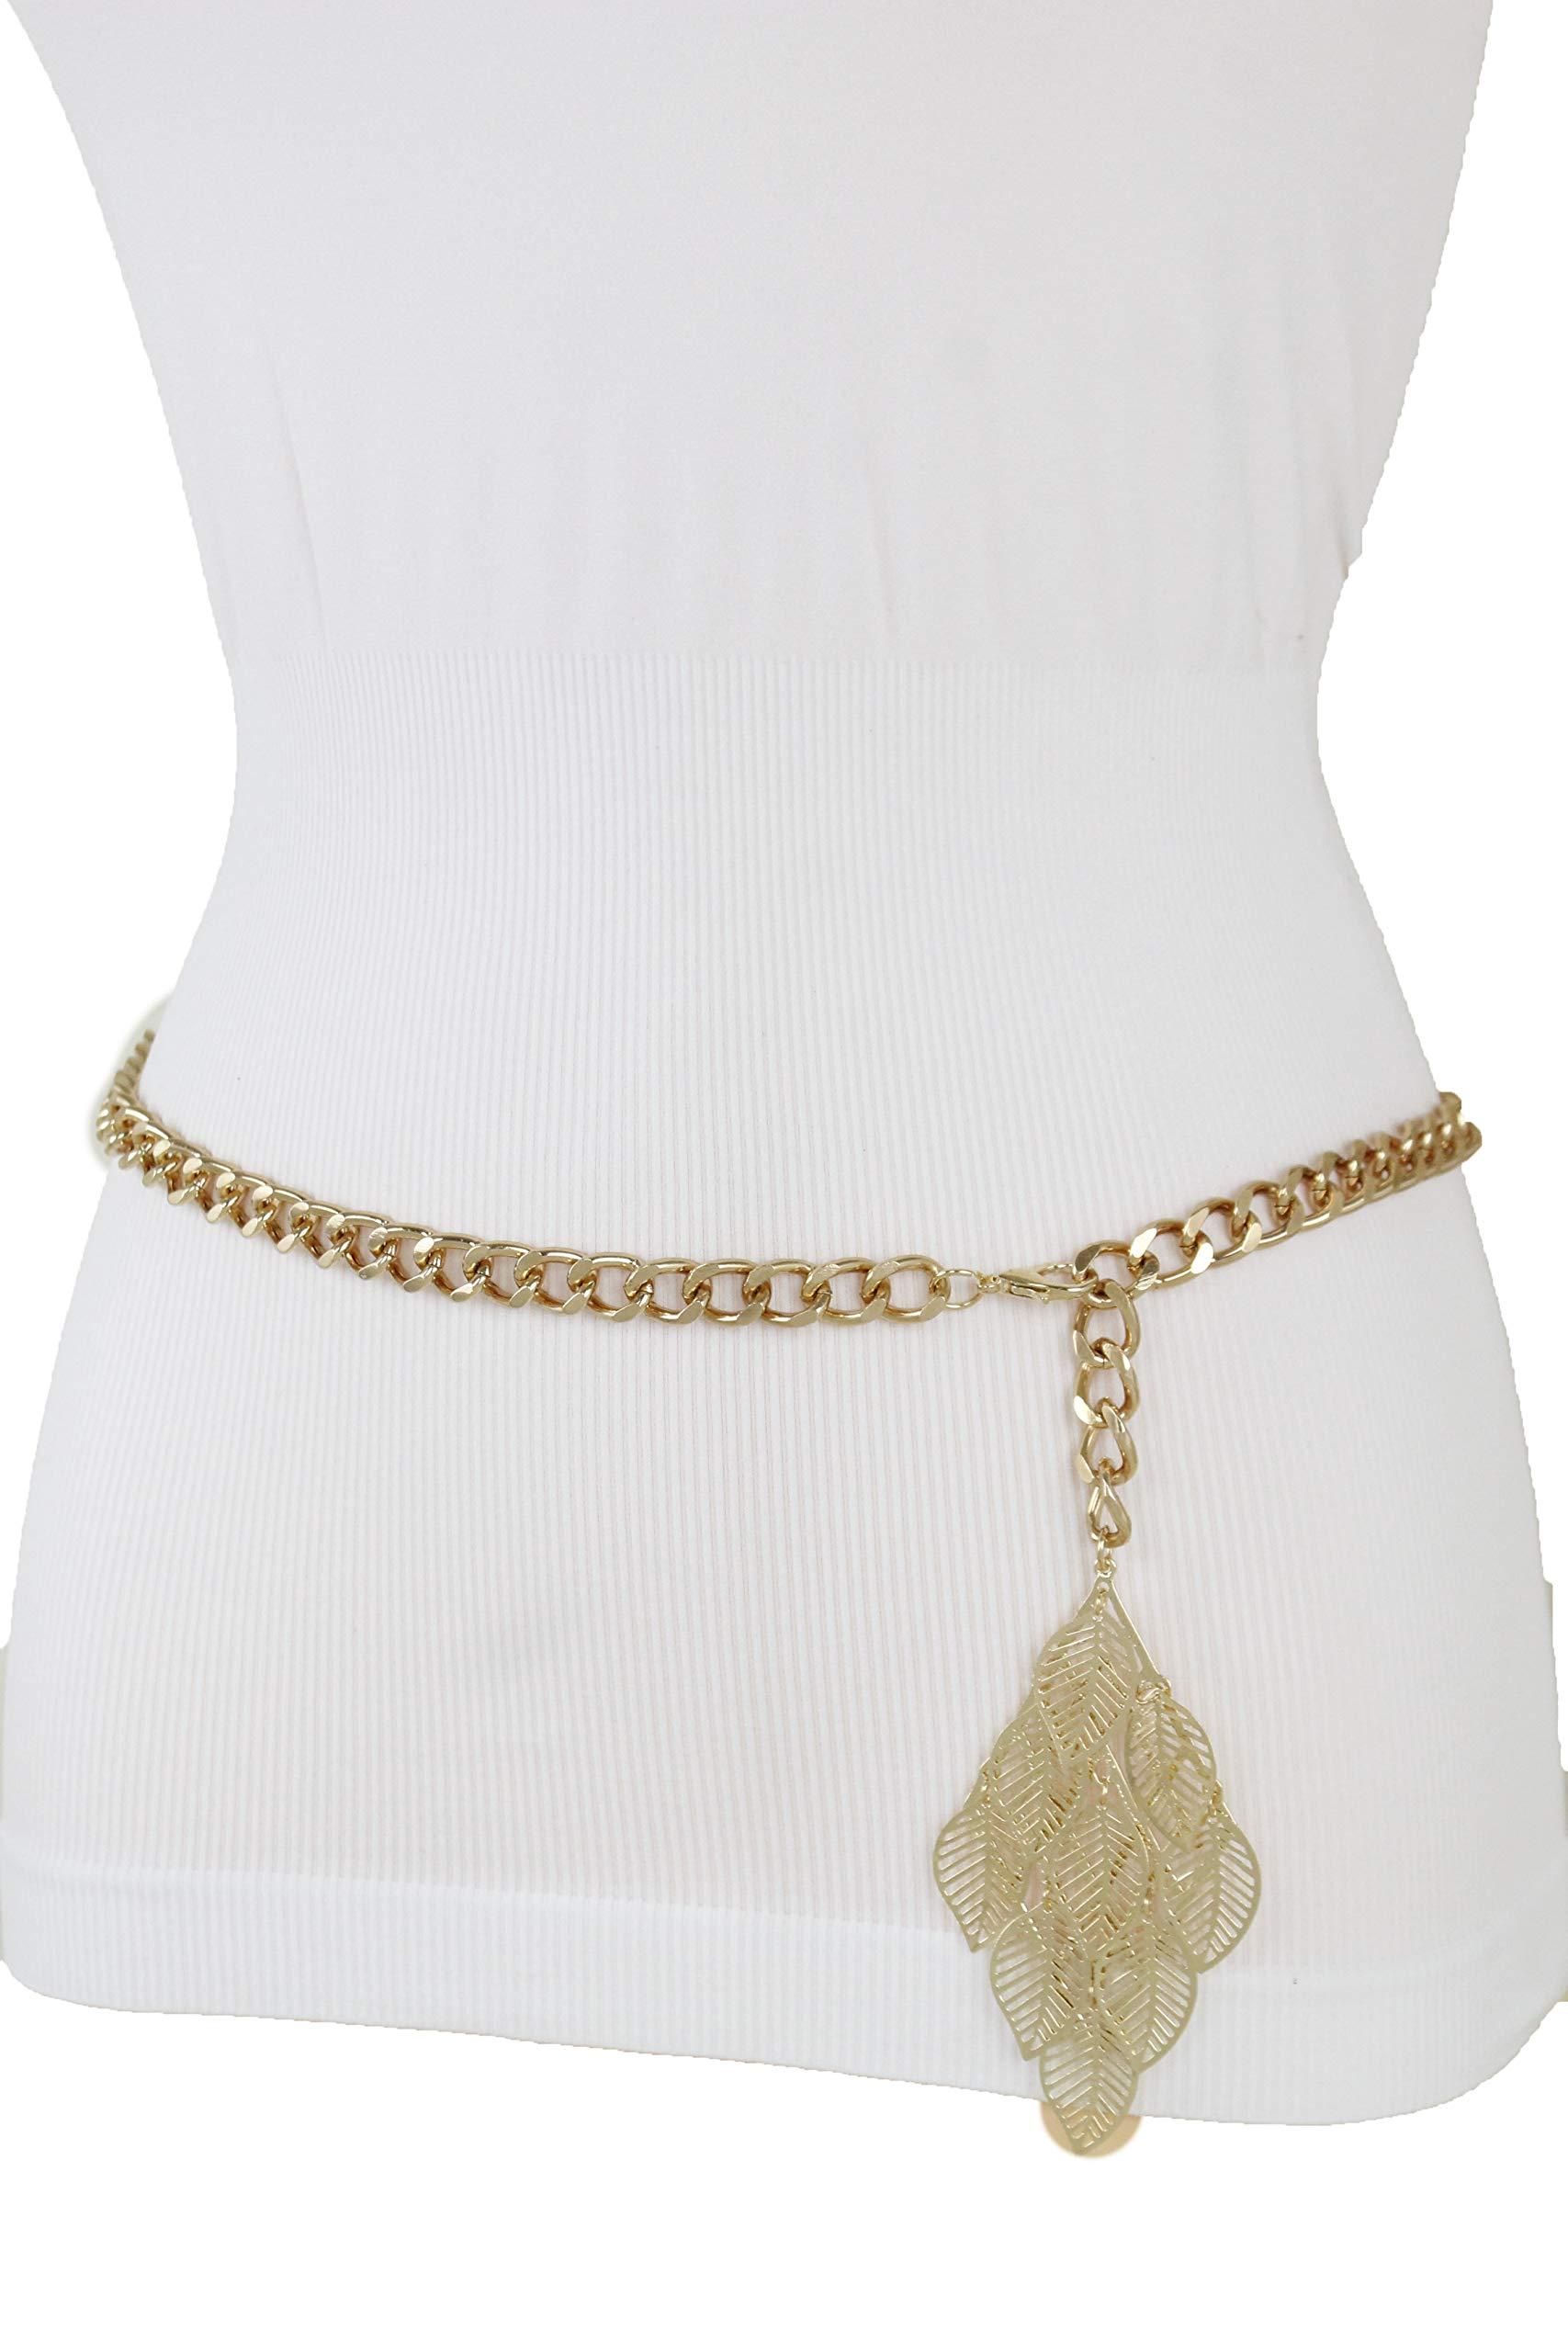 TFJ Women Fashion Belt Hip High Waist Narrow Waistband Gold Metal Chain Leaf Charm Buckle M L XL